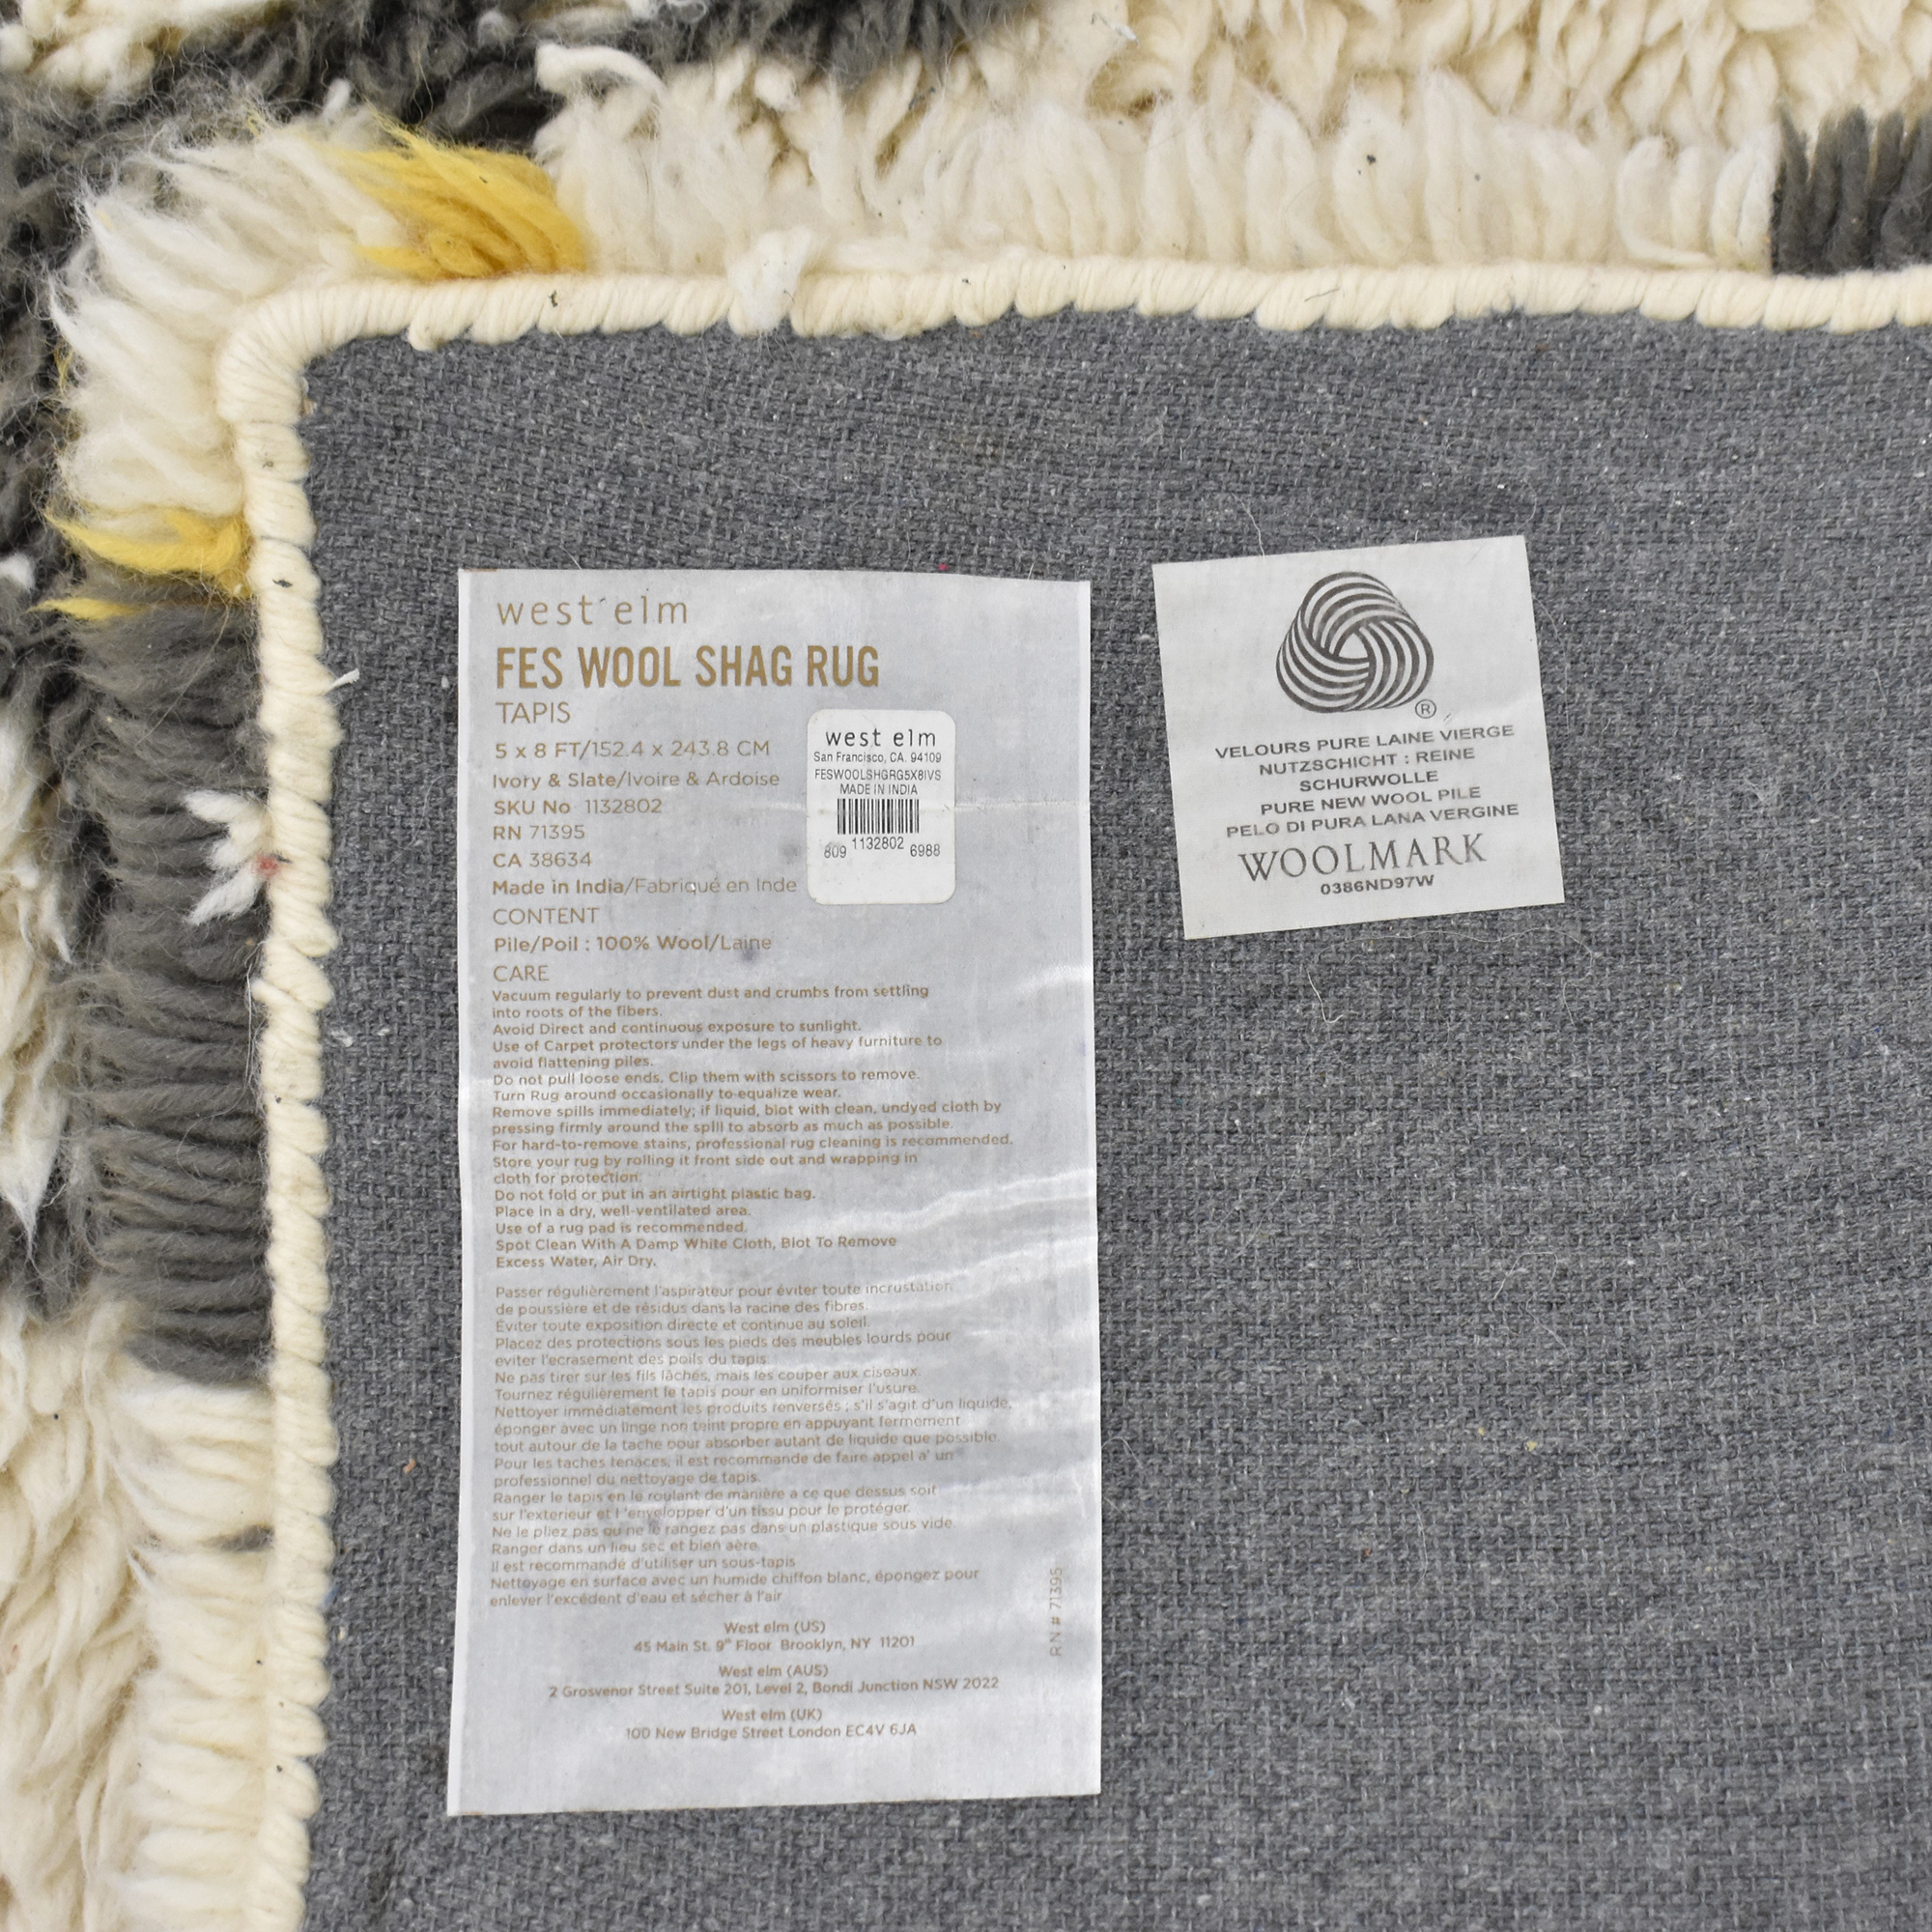 West Elm West Elm Fes Wool Shag Rug discount